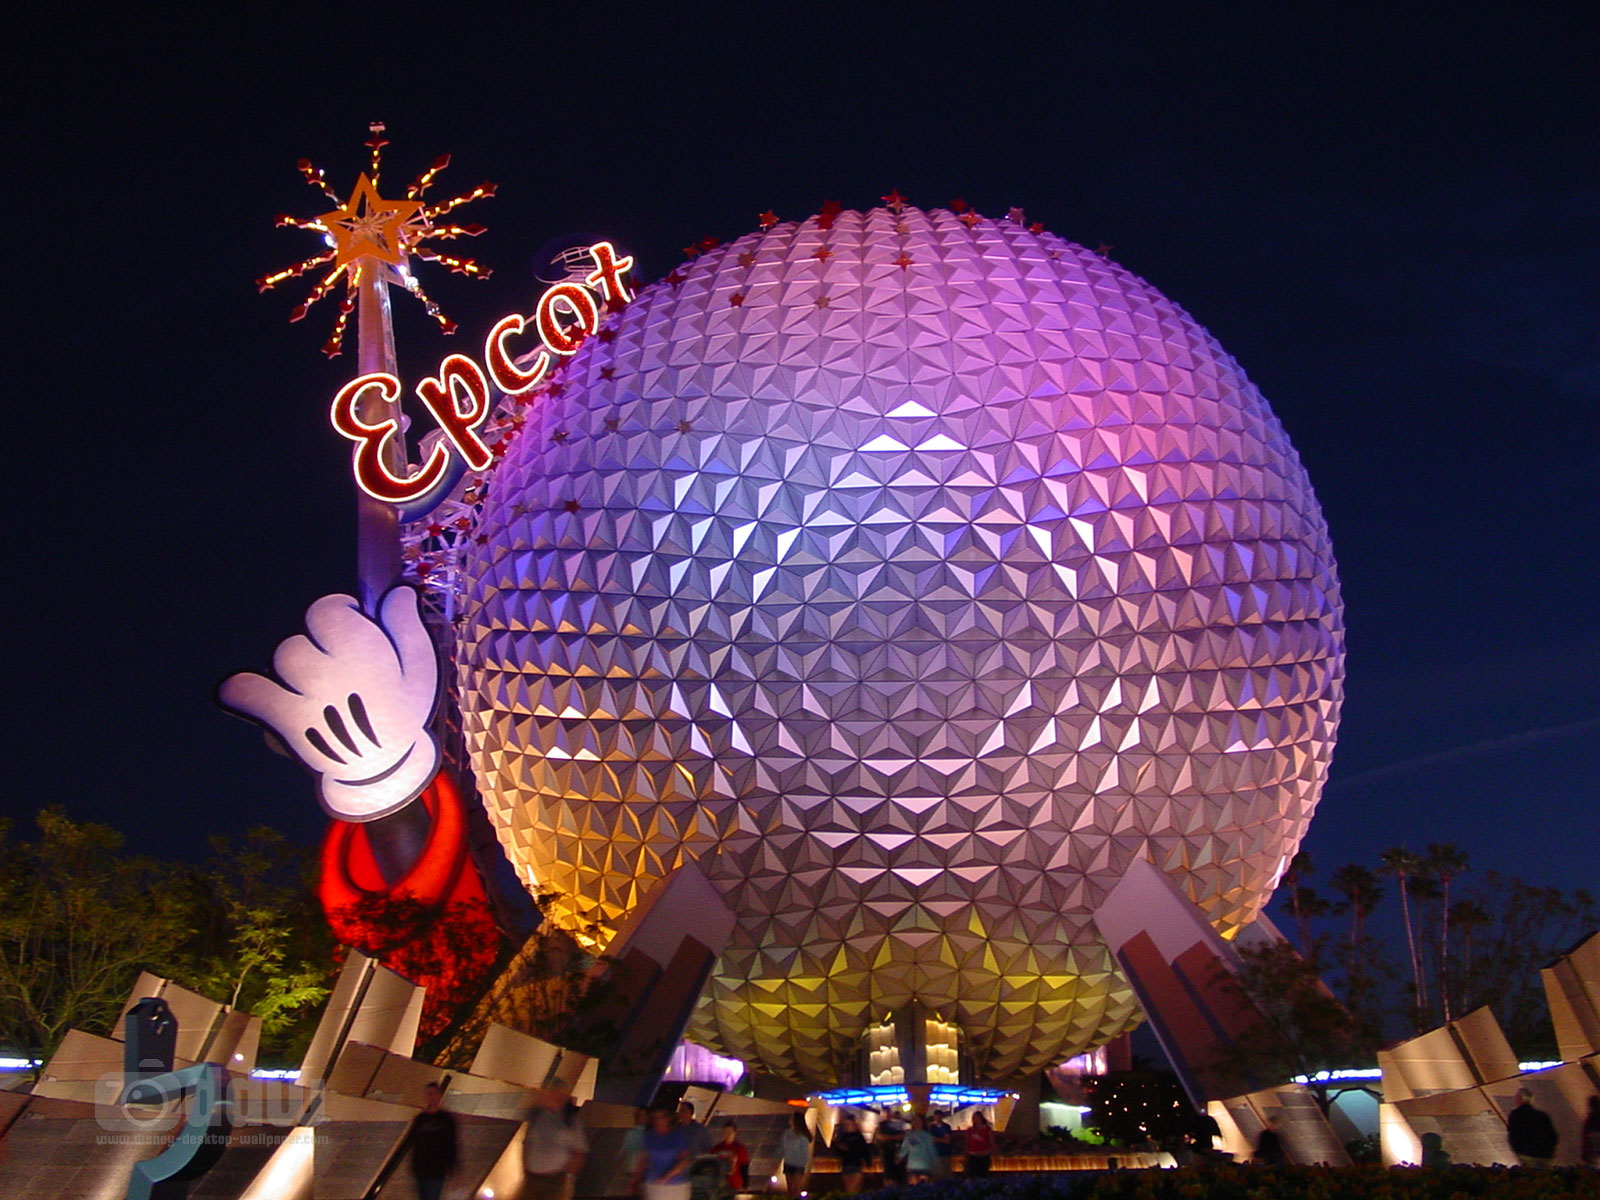 Top 10 Amusement Parks of the World | The Original Top 10 ...